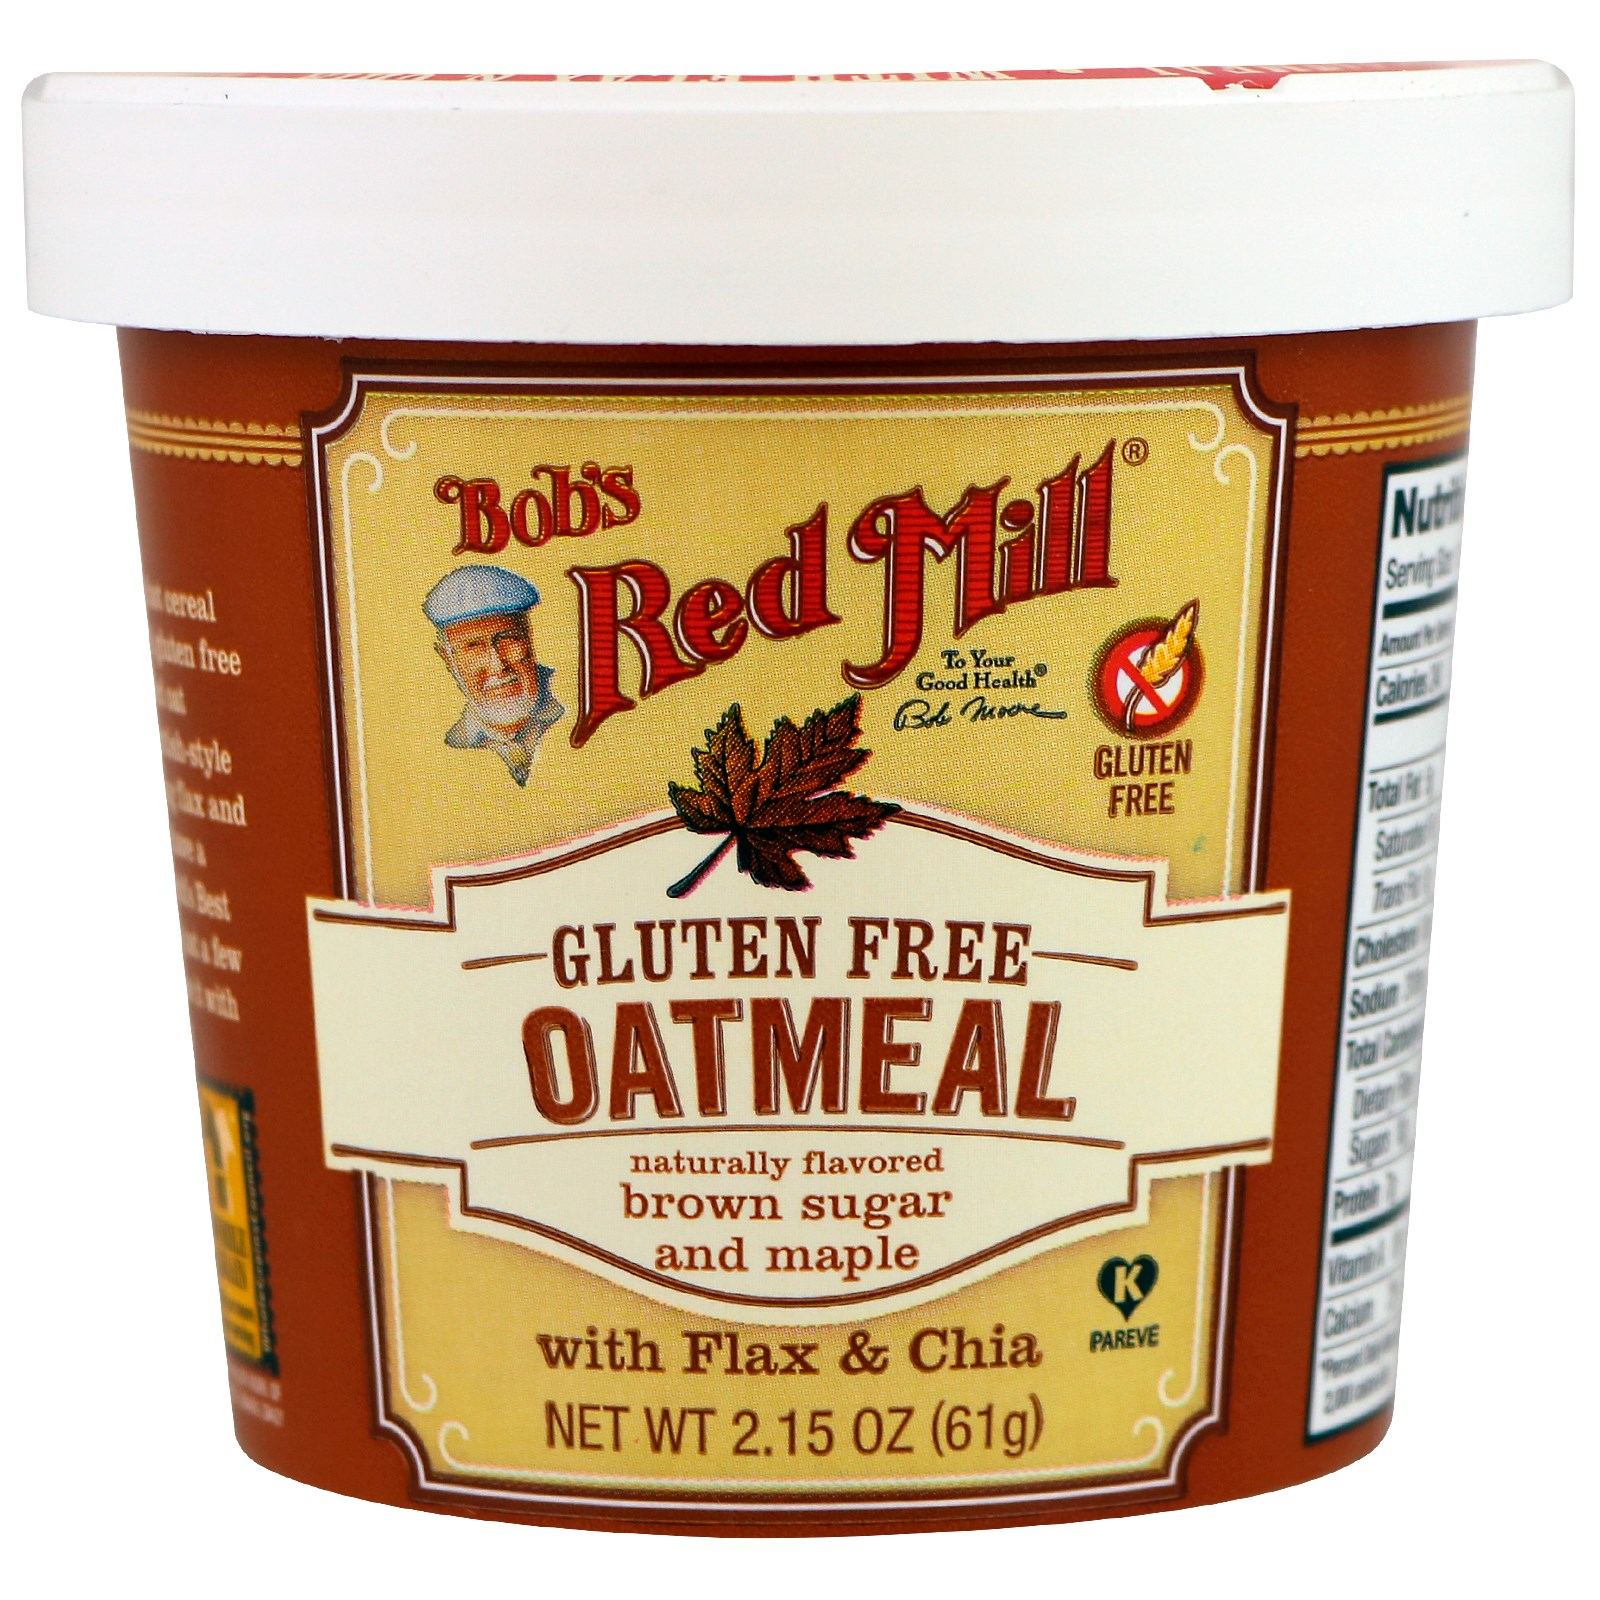 Bob's Red Mill, Овсянка, коричневый сахар и клен, 61 г (2,15 унций)